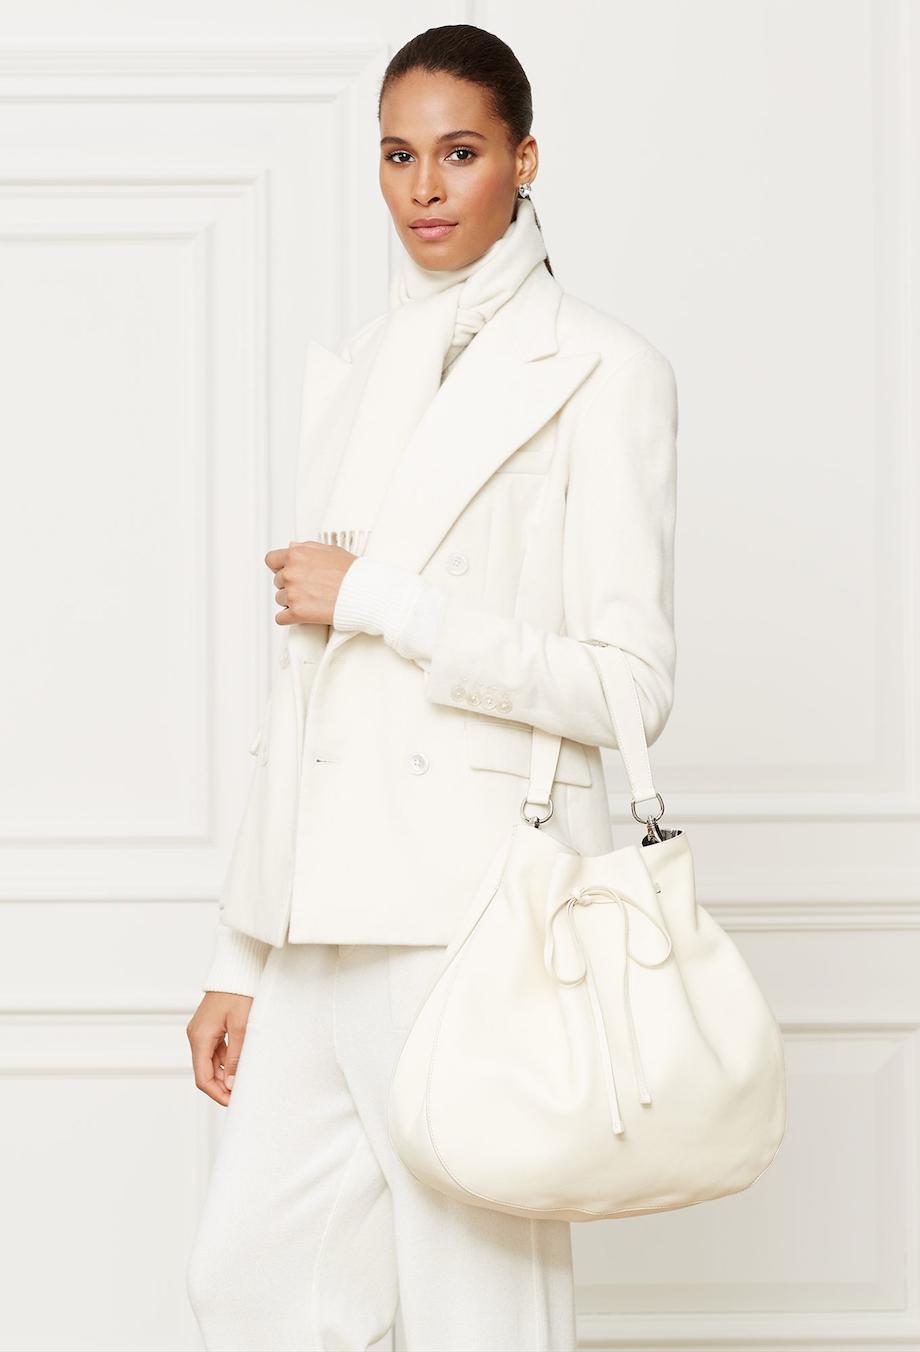 Fashion Model Ralph Lauren Fall 2014 Accessories